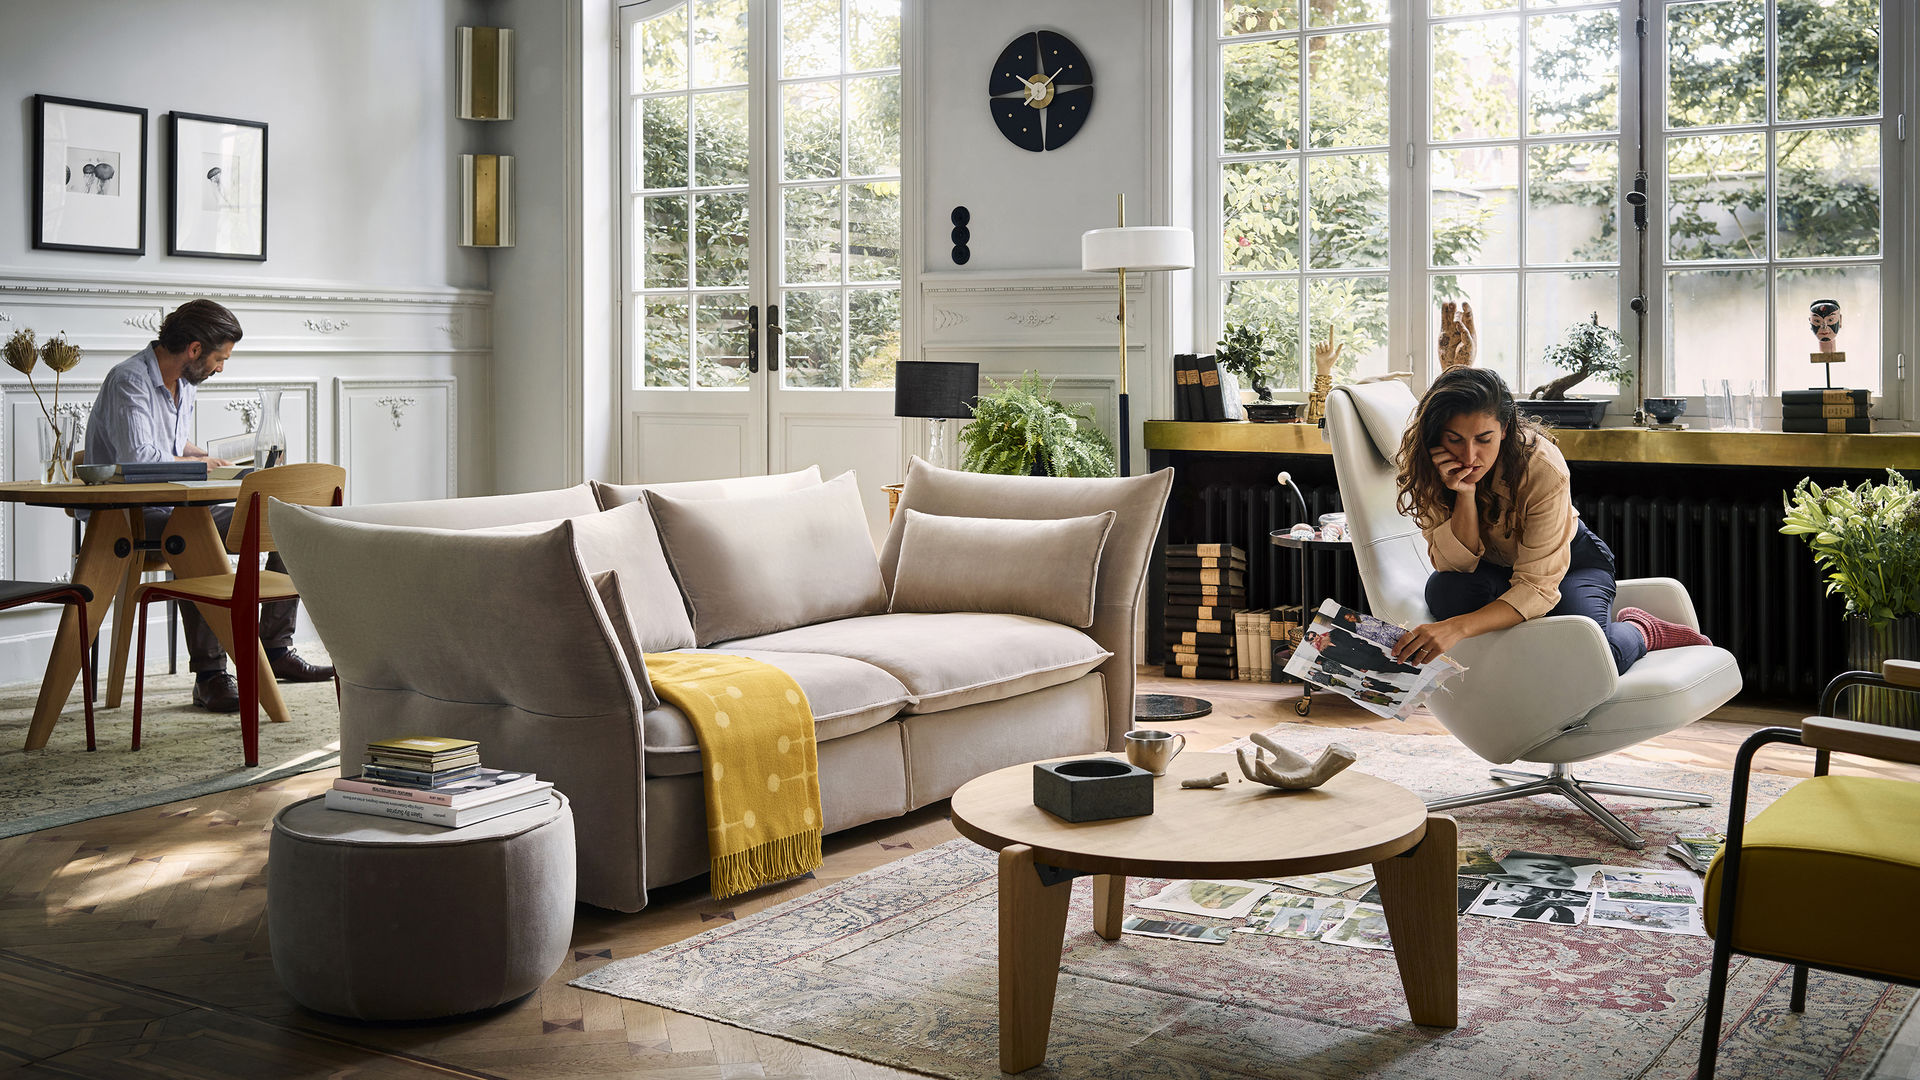 Mariposa Sofa Harald Guéridon Standard Chair Guéridon Bas Fauteuil Direction Repos Pedal Clock Eames Wool Blanket_web_16-9